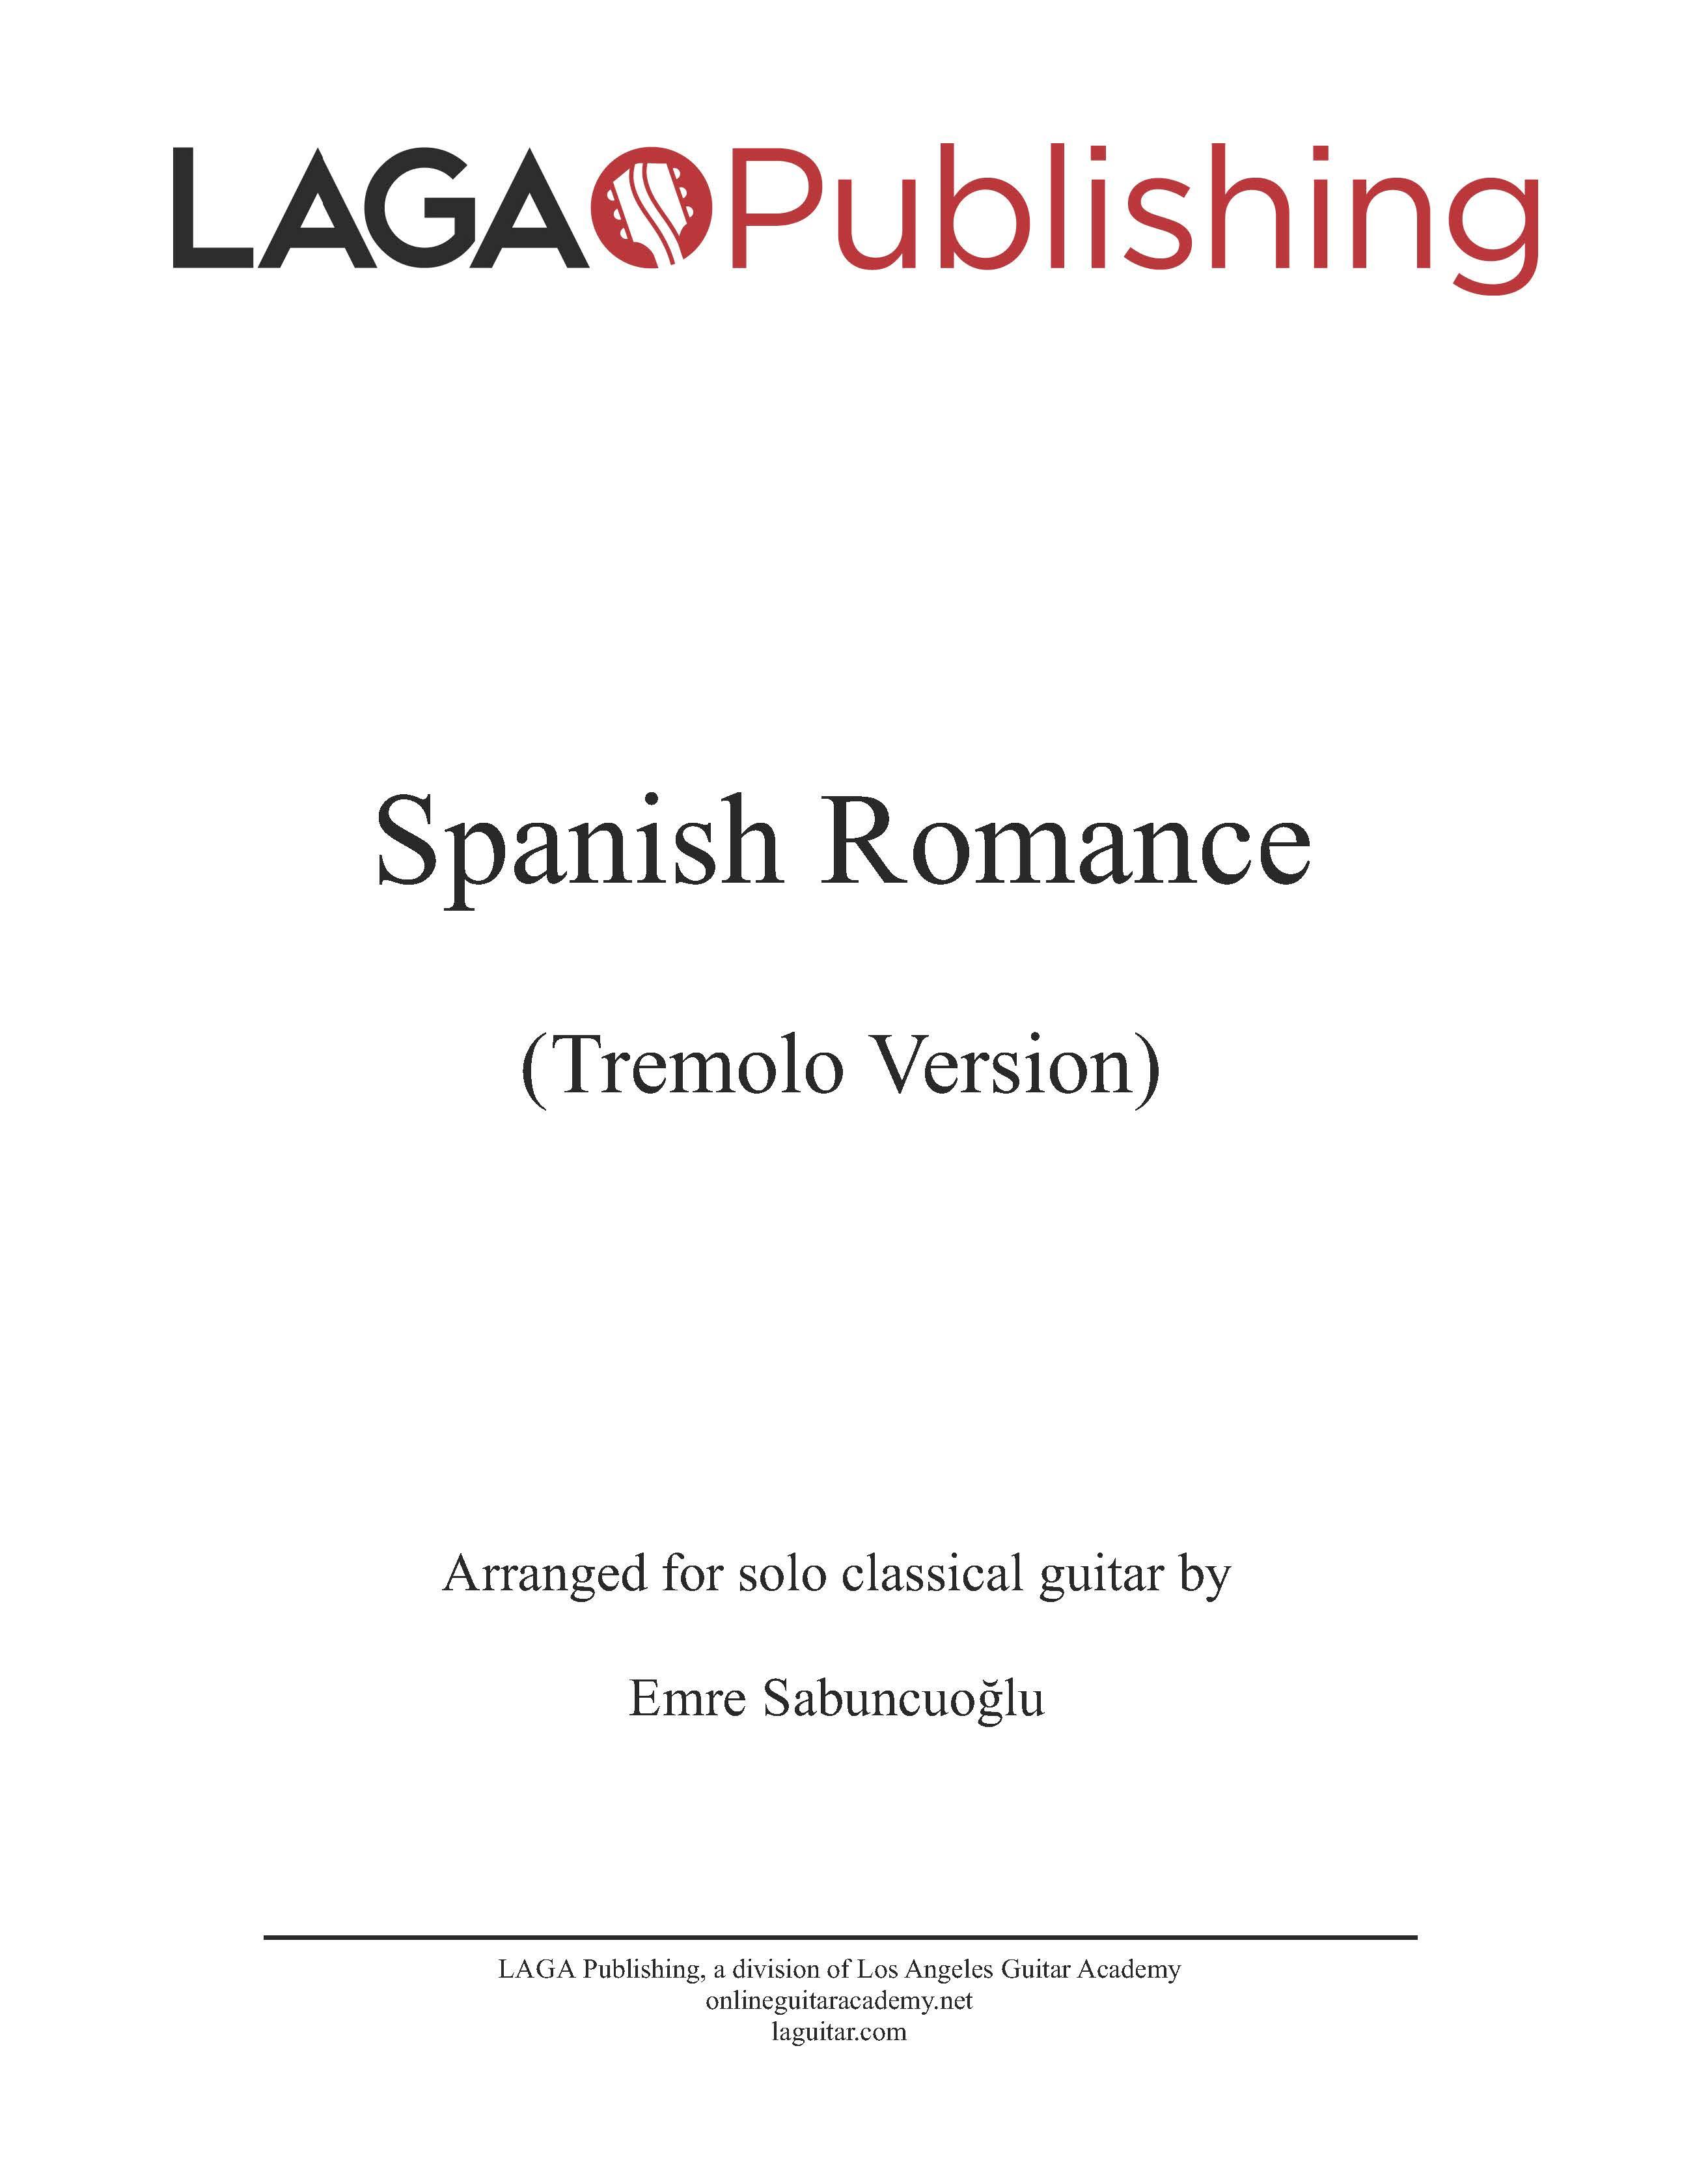 LAGA-Publishing-T-Spanish-Romance-Tremolo-Score-and-Tab